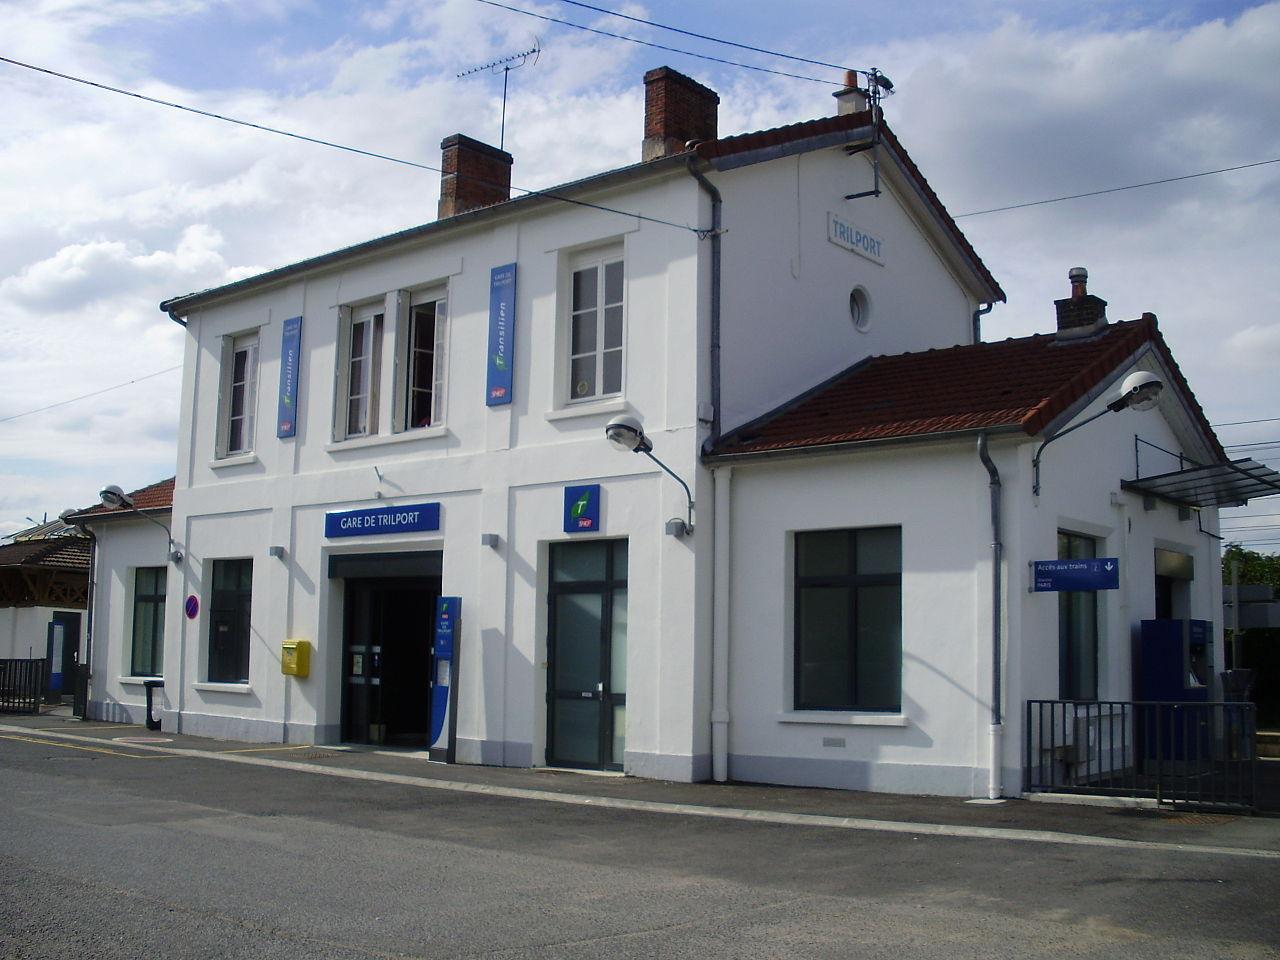 Trilport-train-station